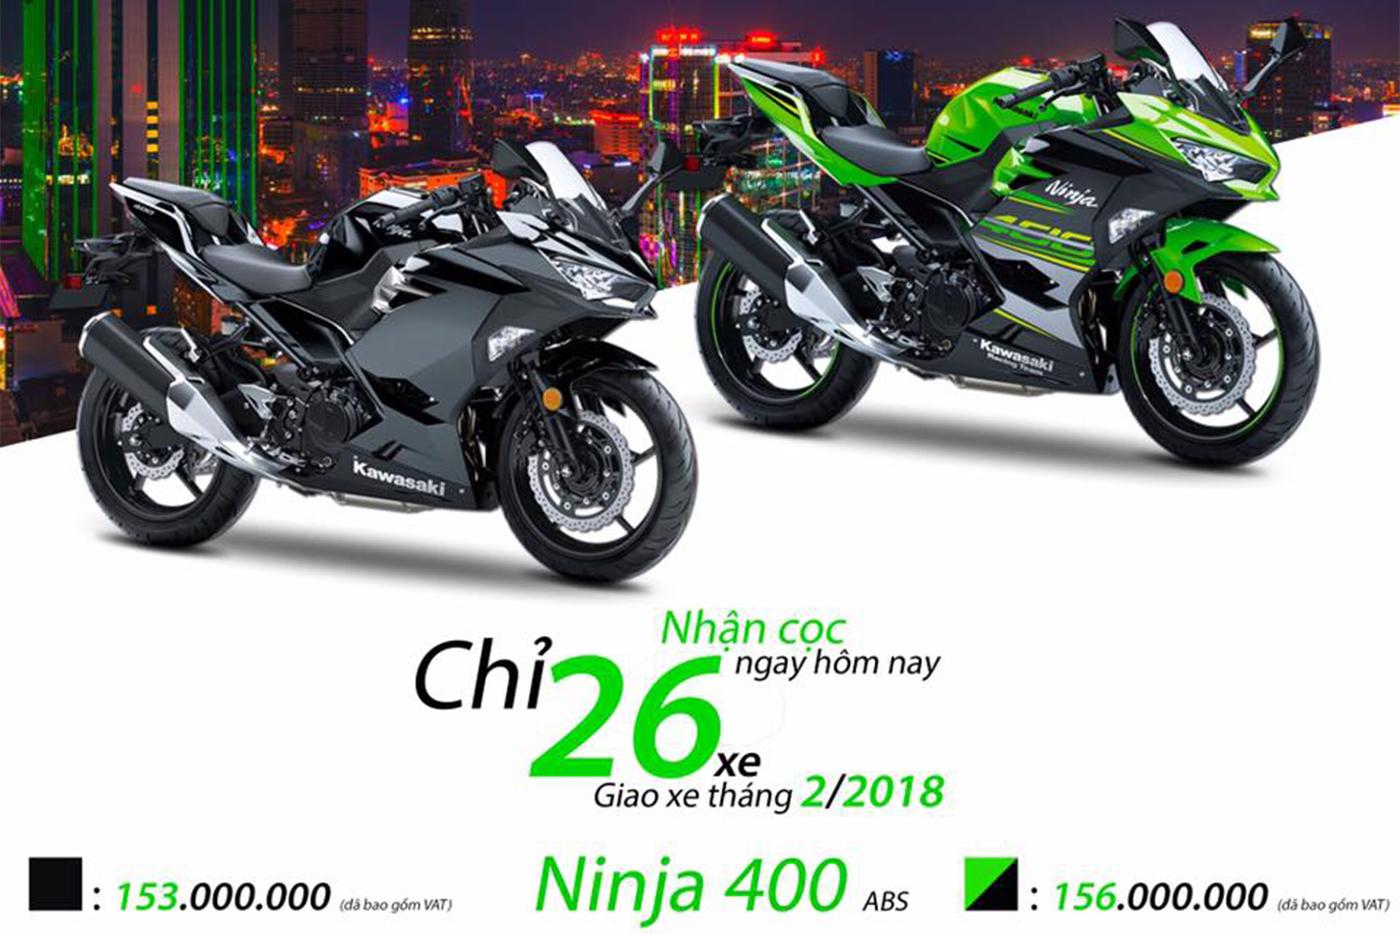 kawasaki-ninja-400-2018.jpg